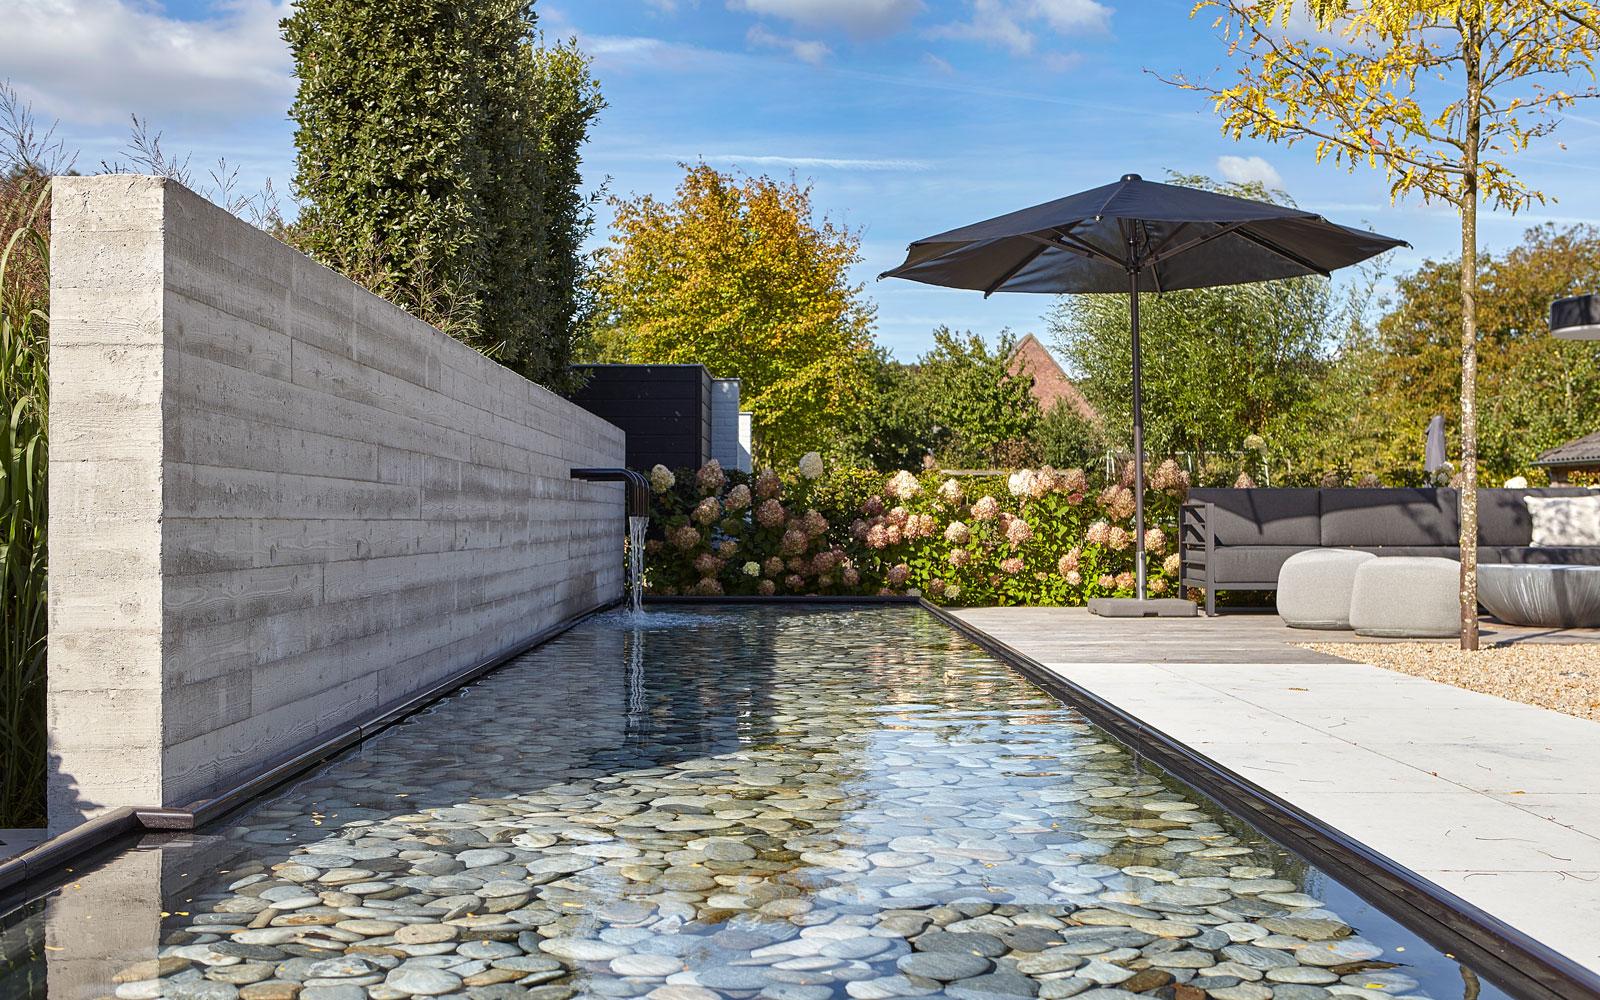 Tuin, natuuroase, Groenseizoen, tuinarchitect, vijver, Dirk van der Poel